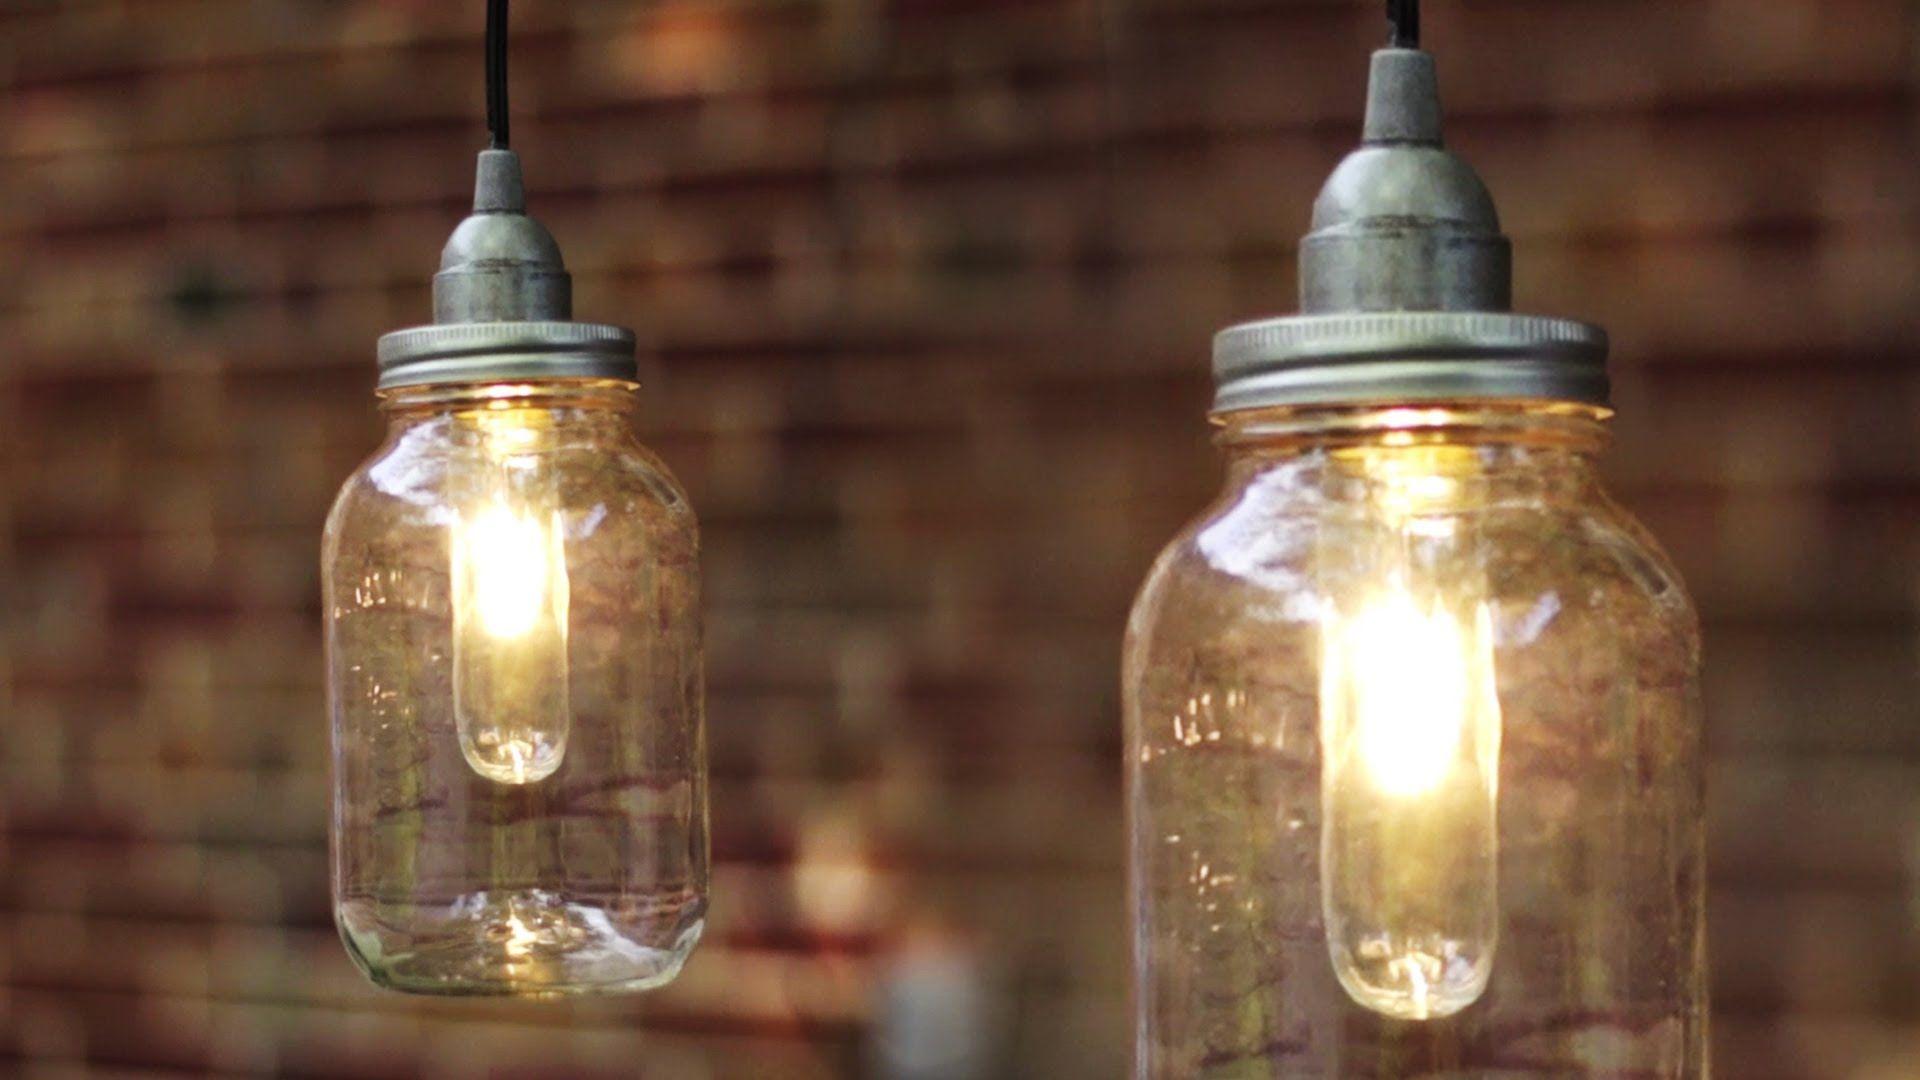 Diy Mason Jar Lamp Tutorial Diy Crafts And Projects Diy Diy Projects Diylamps Diy Mason Jar Lights Mason Jar Pendant Light Mason Jar Chandelier